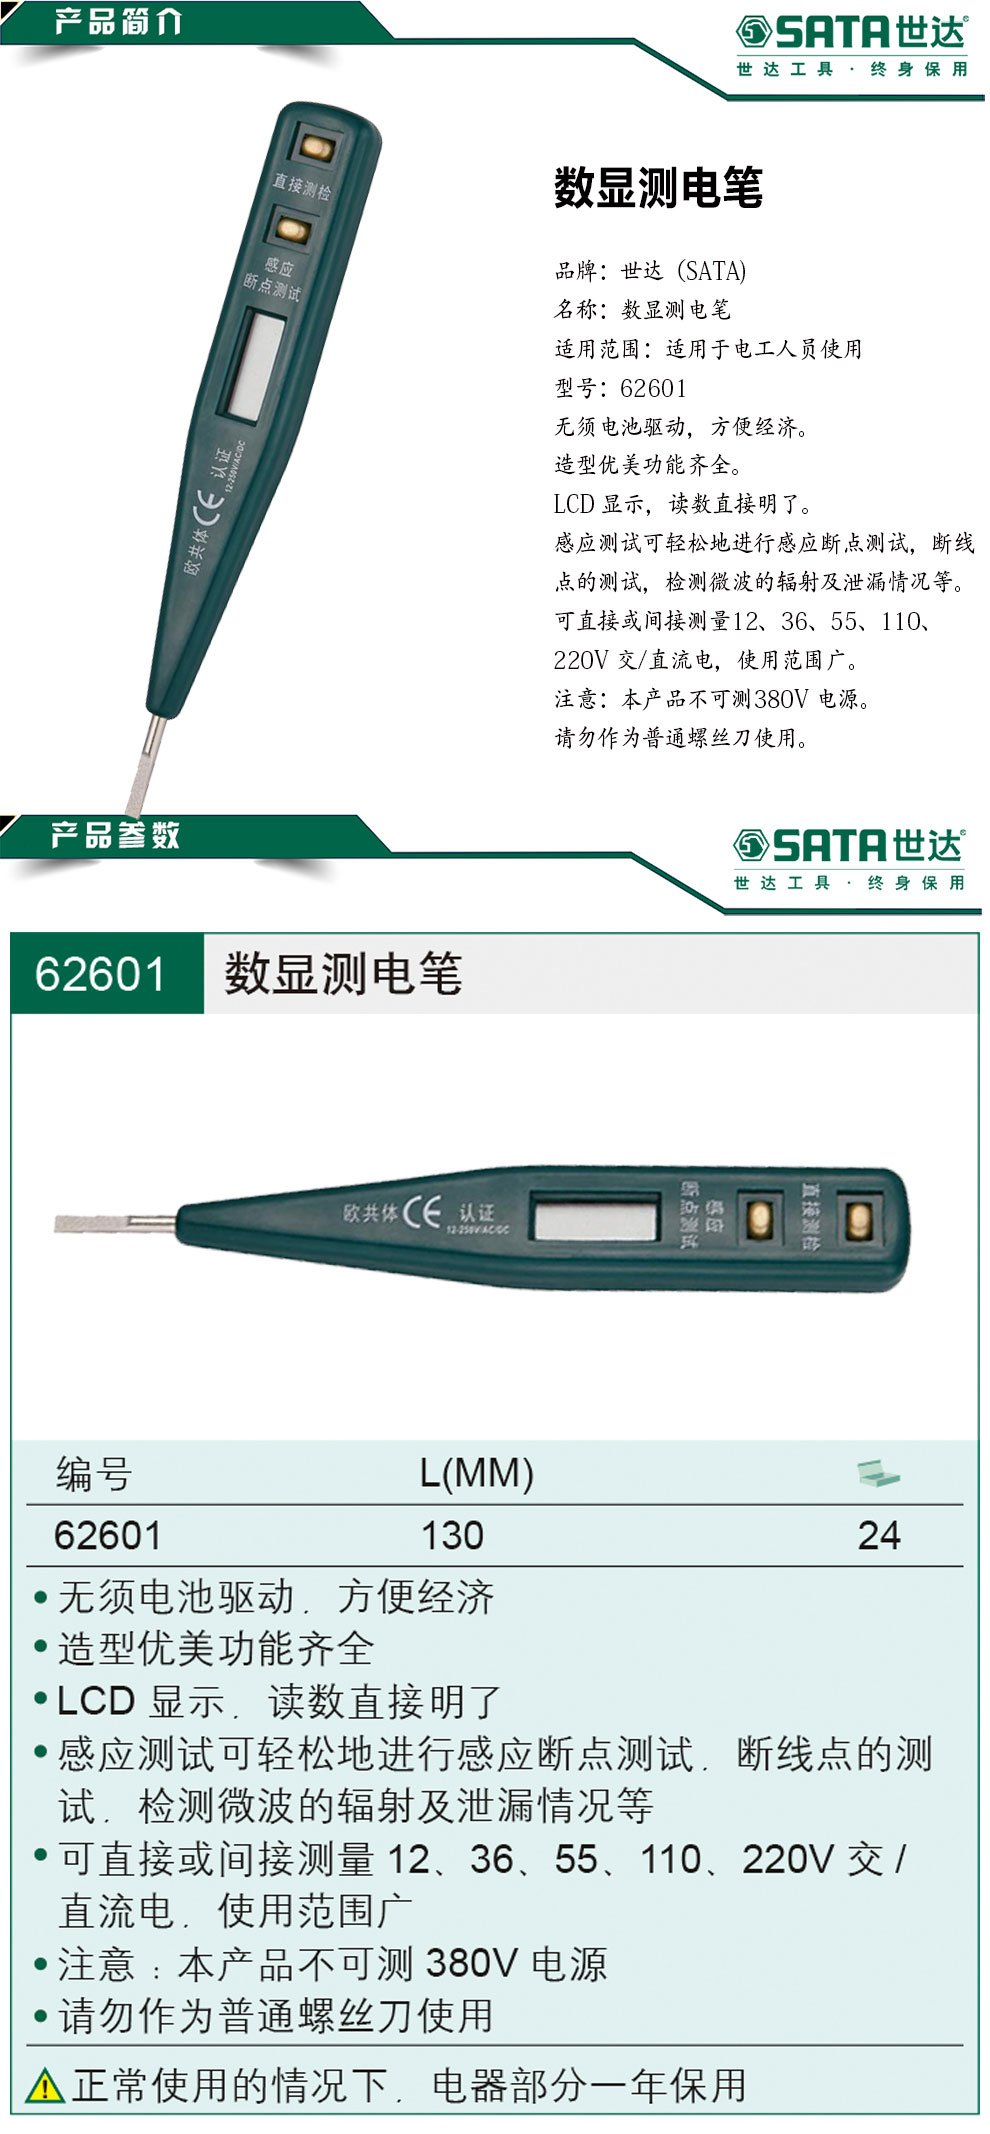 sata 世达 数显测电笔 试电笔 验电笔 62601(供应商直送)